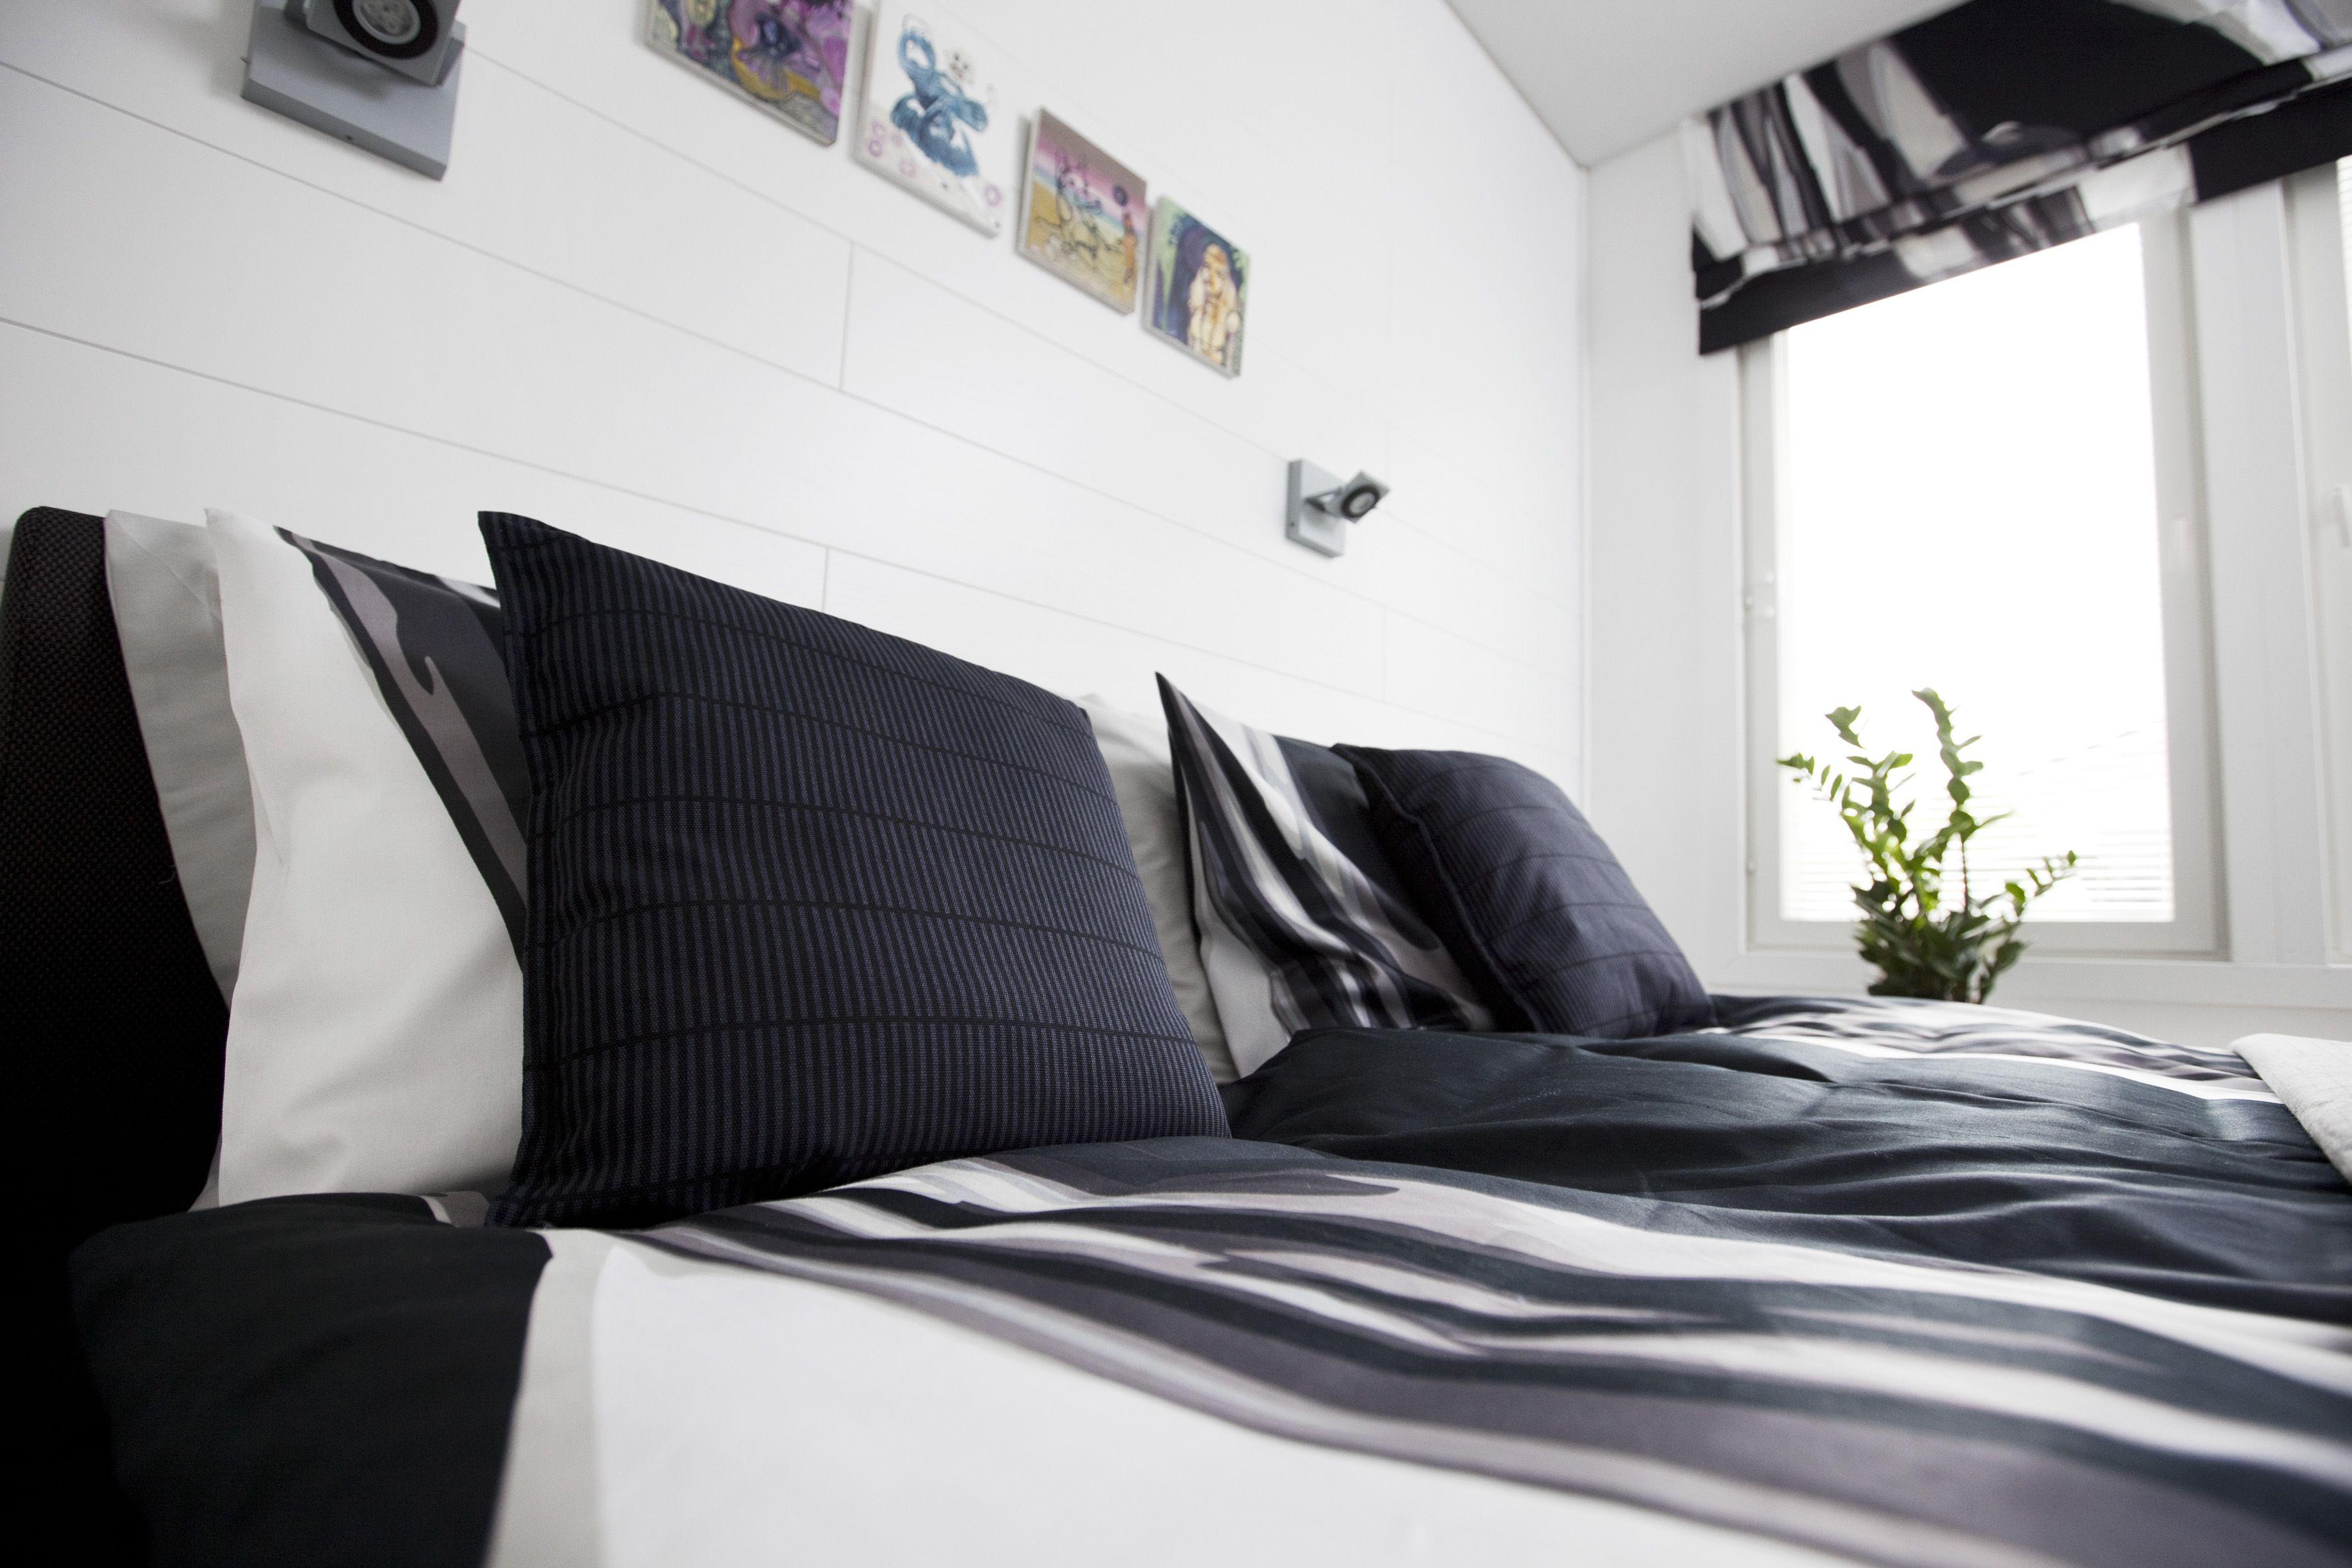 Finlayson Loitsu satin bed linen set I Loitsu-satiinipussilakanasetti 59 €